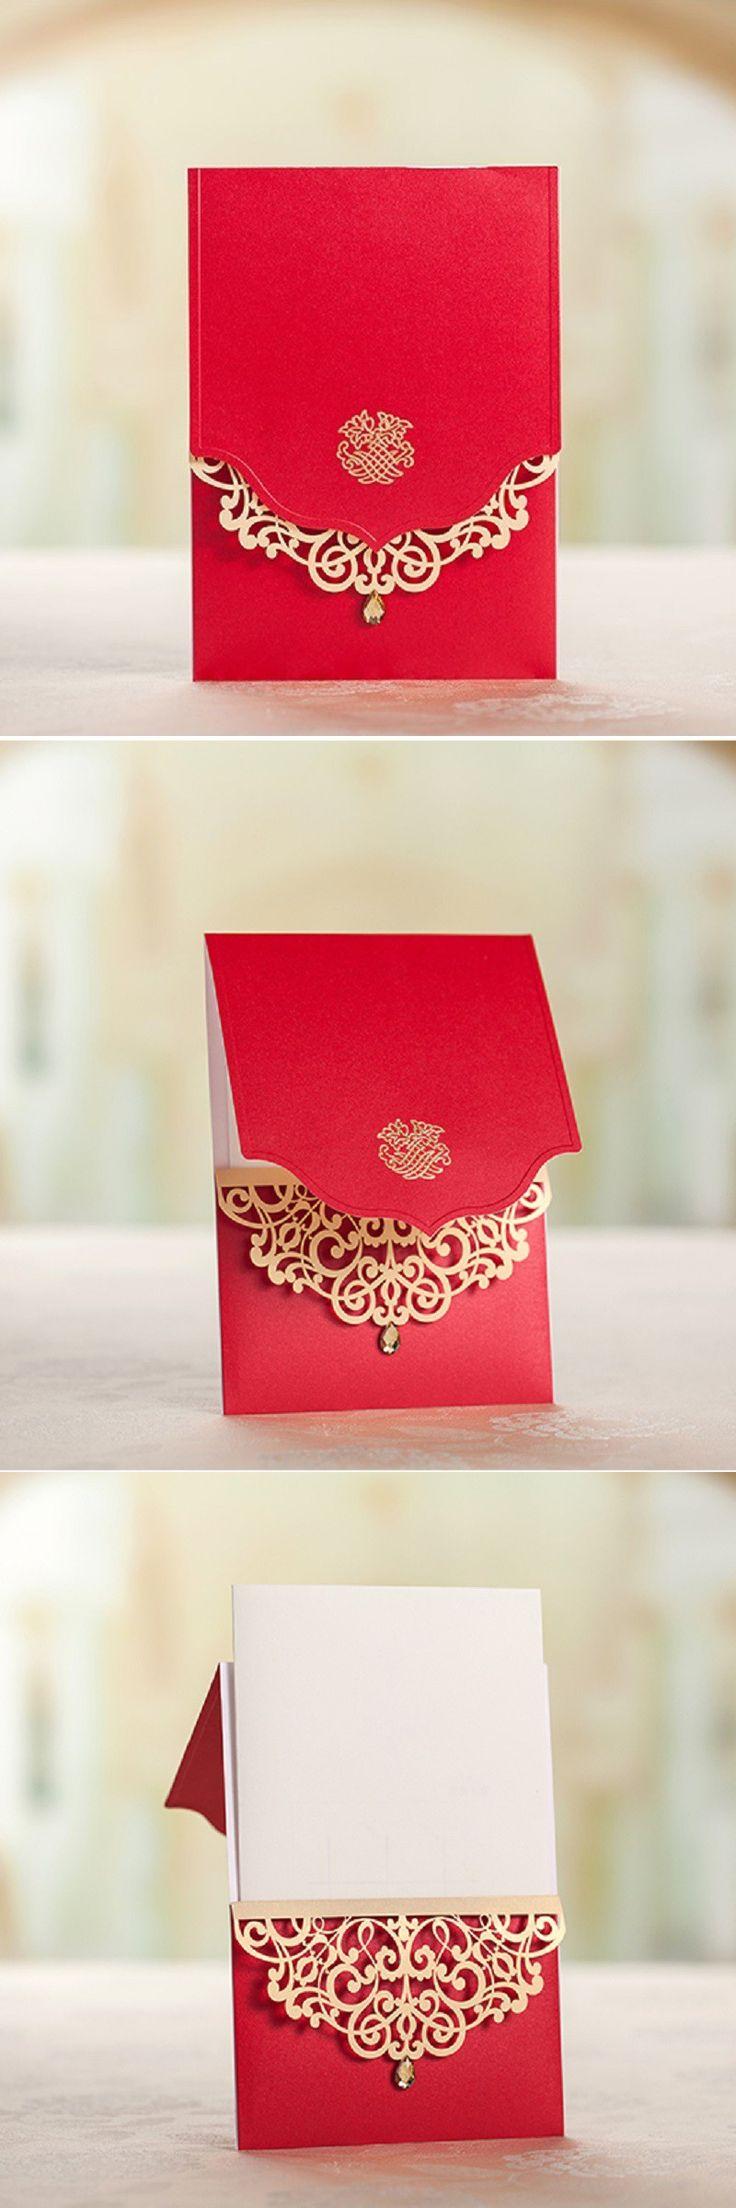 pre cut card for wedding invitations